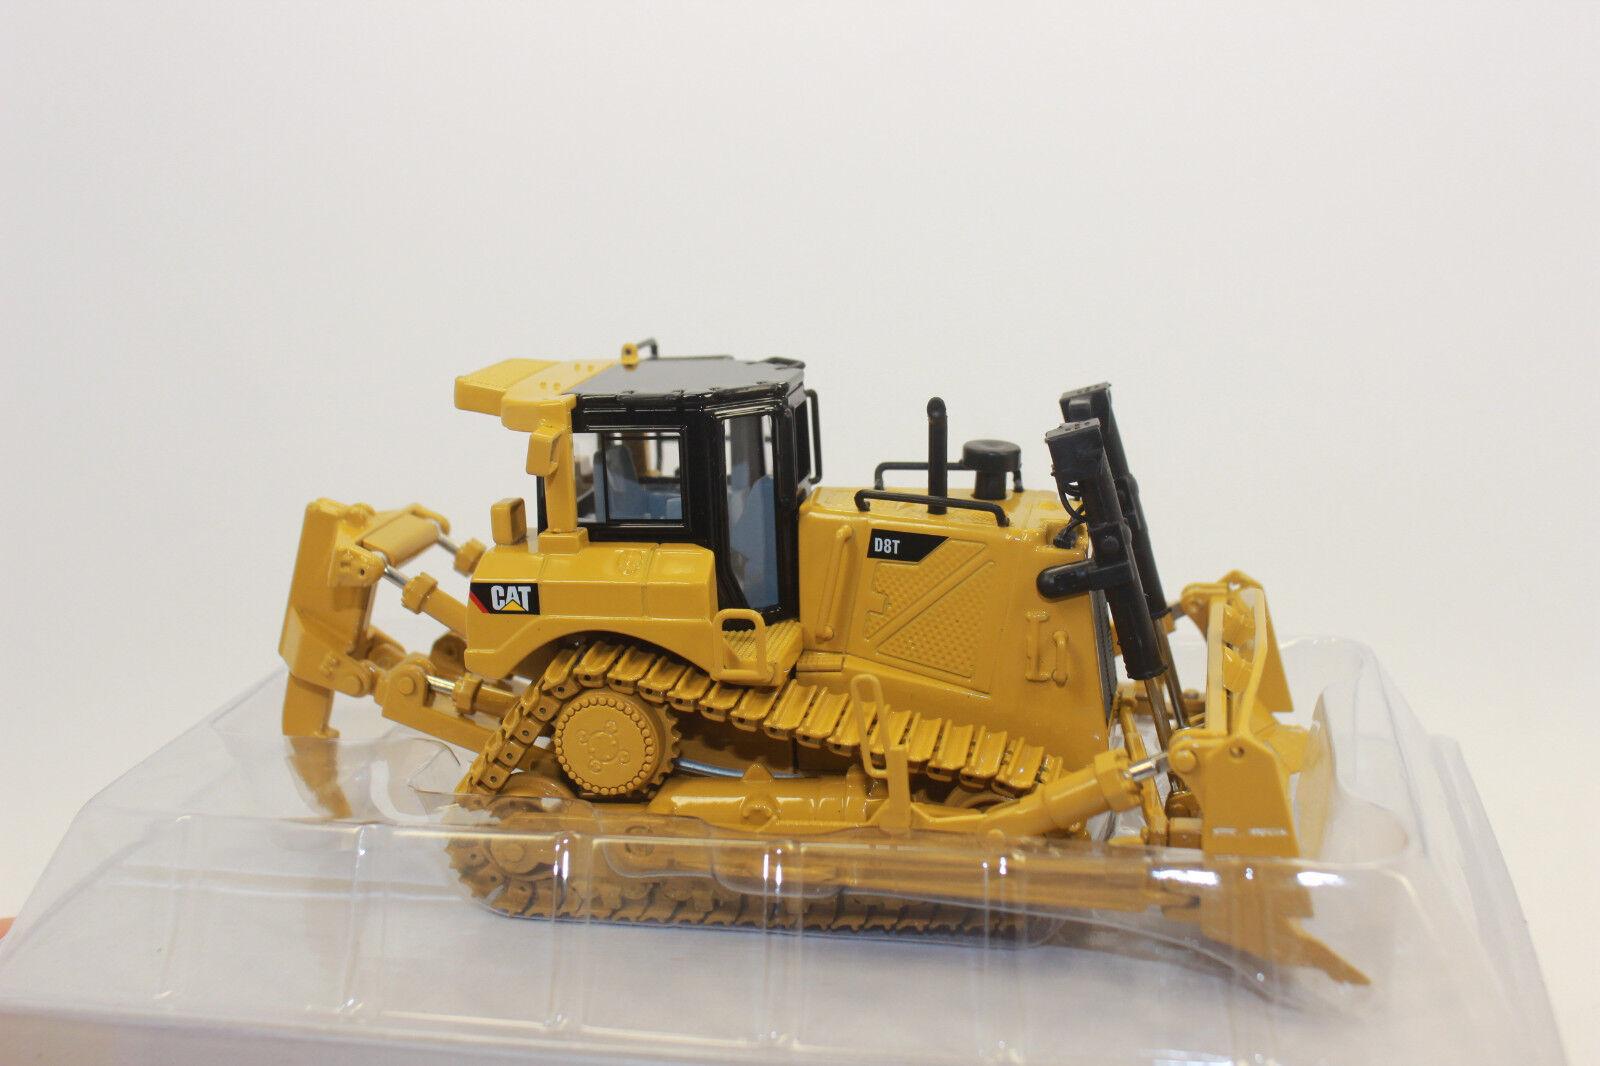 NORSCOT 55299 CAT Caterpillar d8t bouteur 1 50 NEUF avec emballage d'origine